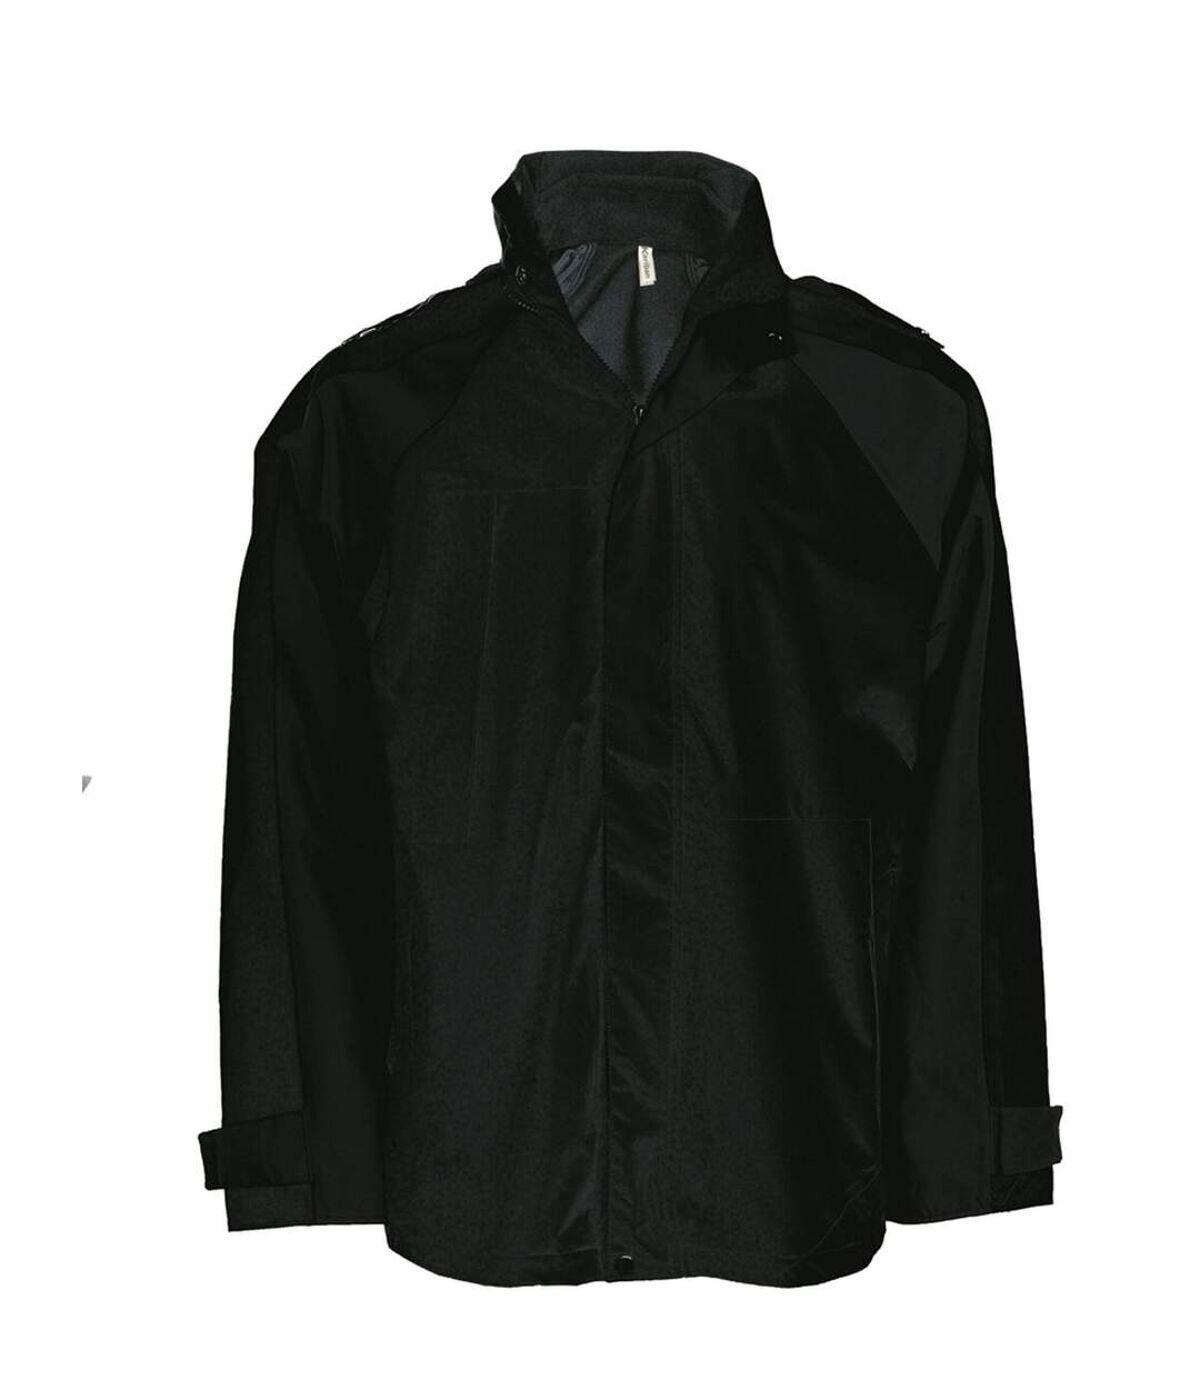 Parka Homme 3 en 1 - K657 - noir